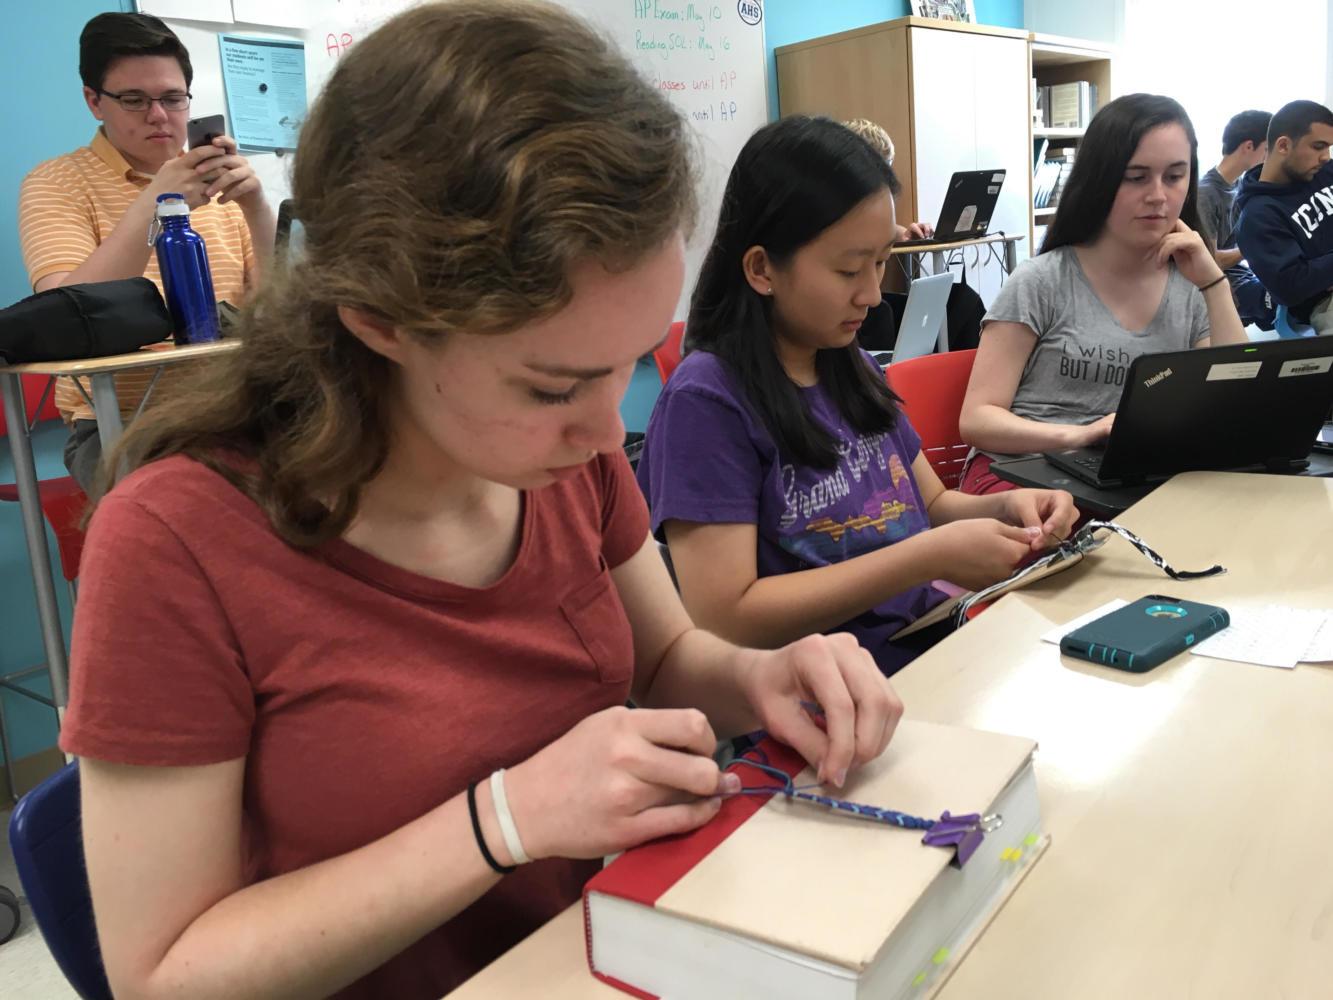 Juniors Mattie Wiseman and Emma Kim make friendship bracelets in their English class. Wiseman has made five bracelets so far this year.